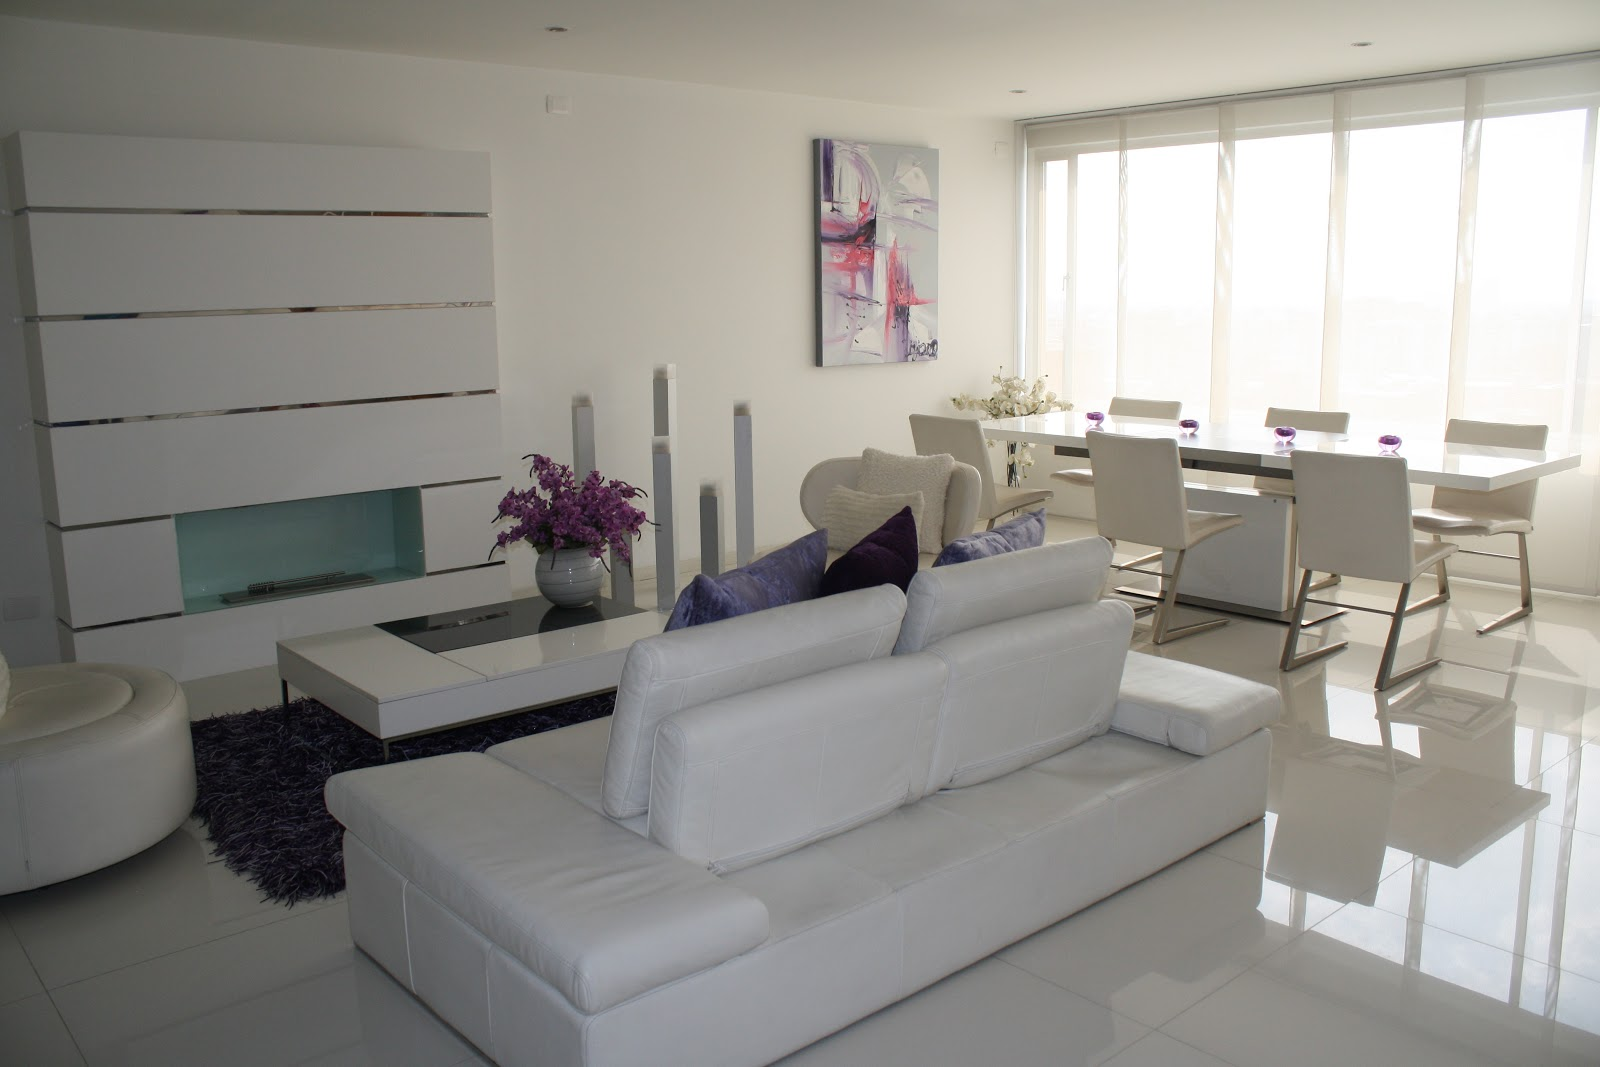 Interiores24 dise o de interiores bogota for Estudiar decoracion de interiores